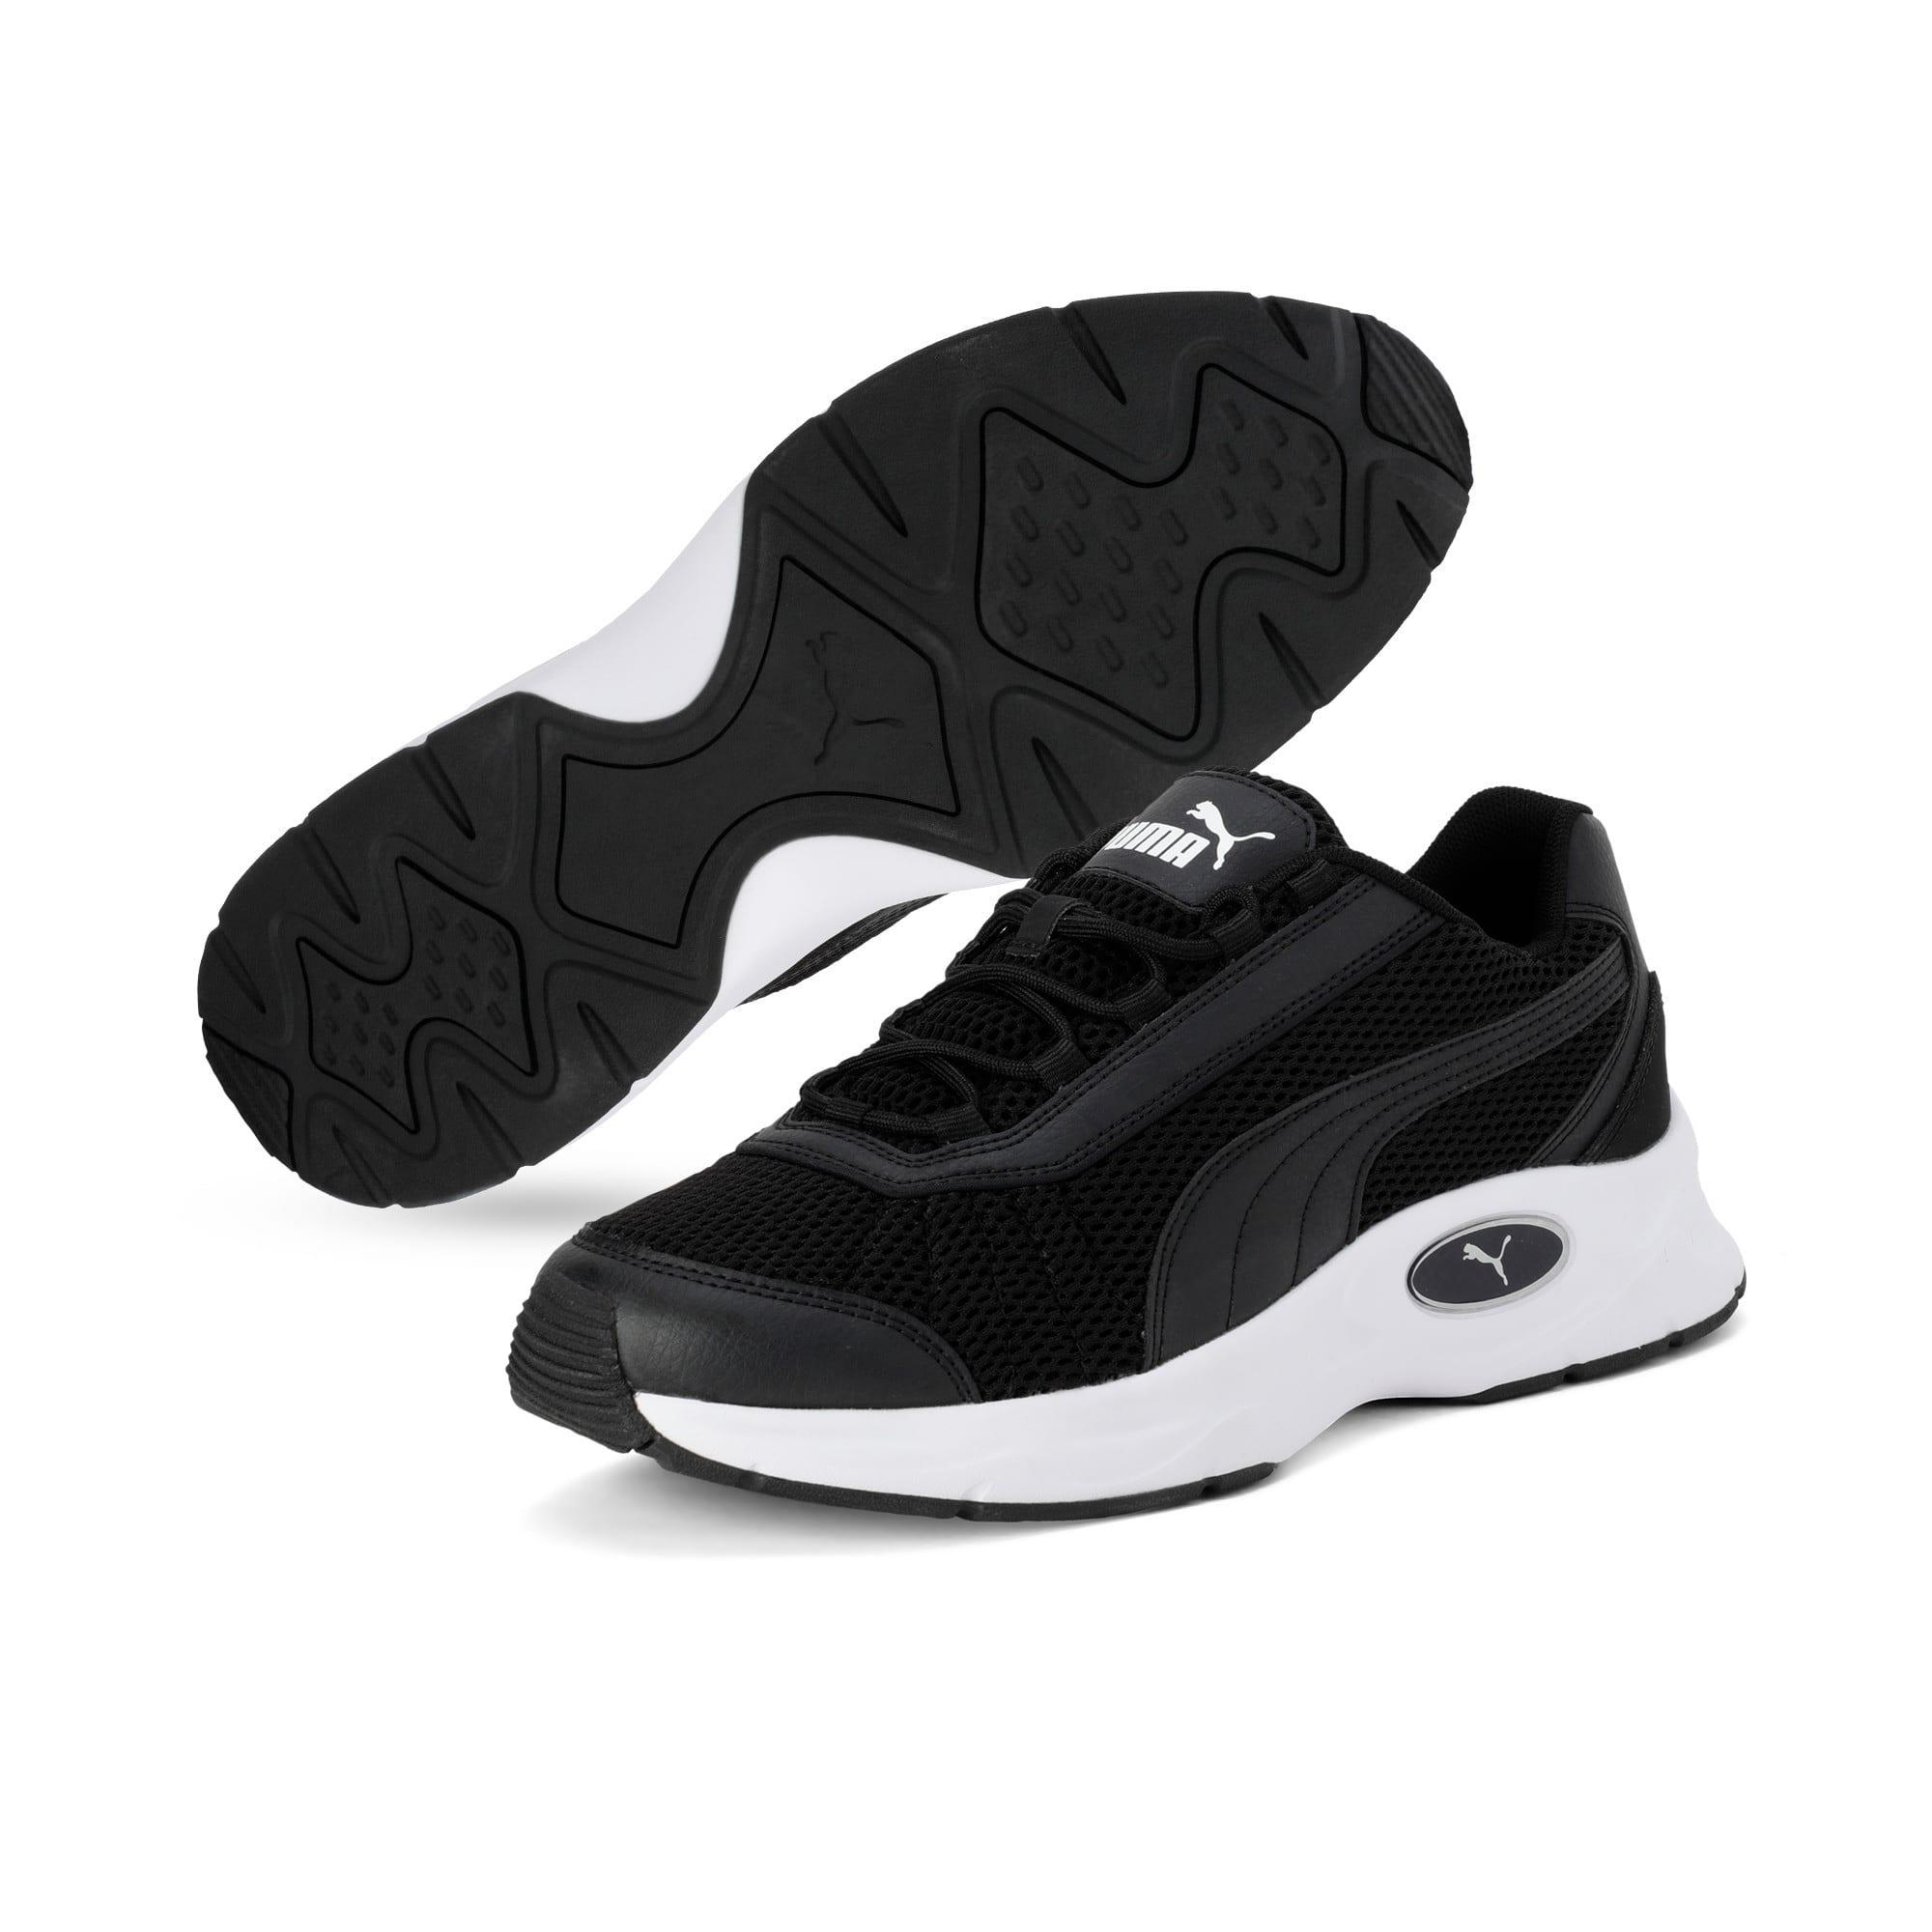 Thumbnail 4 of Nucleus Training Shoes, Puma Black-Puma Black, medium-IND